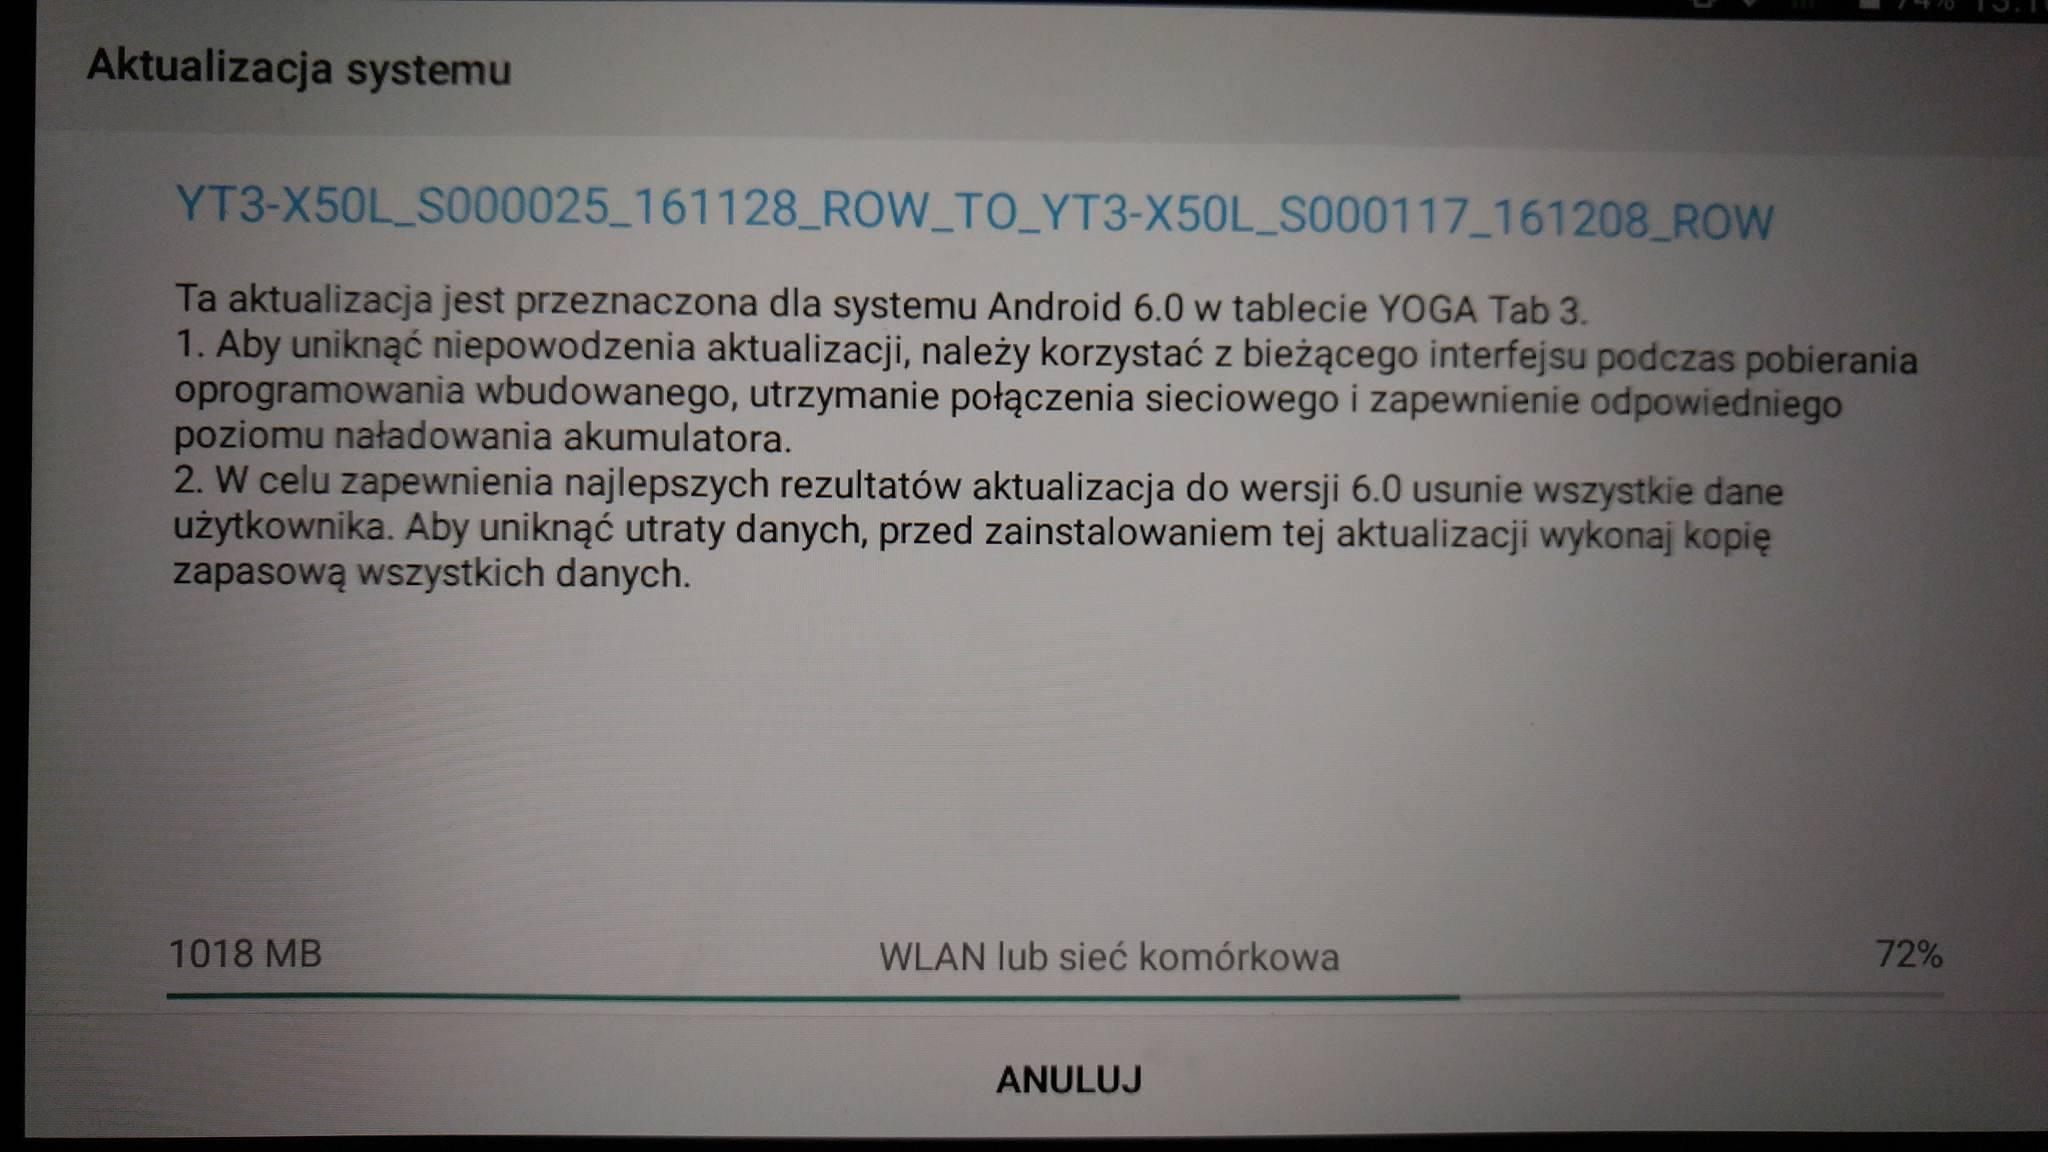 Tabletowo.pl Lenovo Yoga Tab 3 (X50L) 2GB z Orange dostaje Androida 6.0.1 Marshmallow Aktualizacje